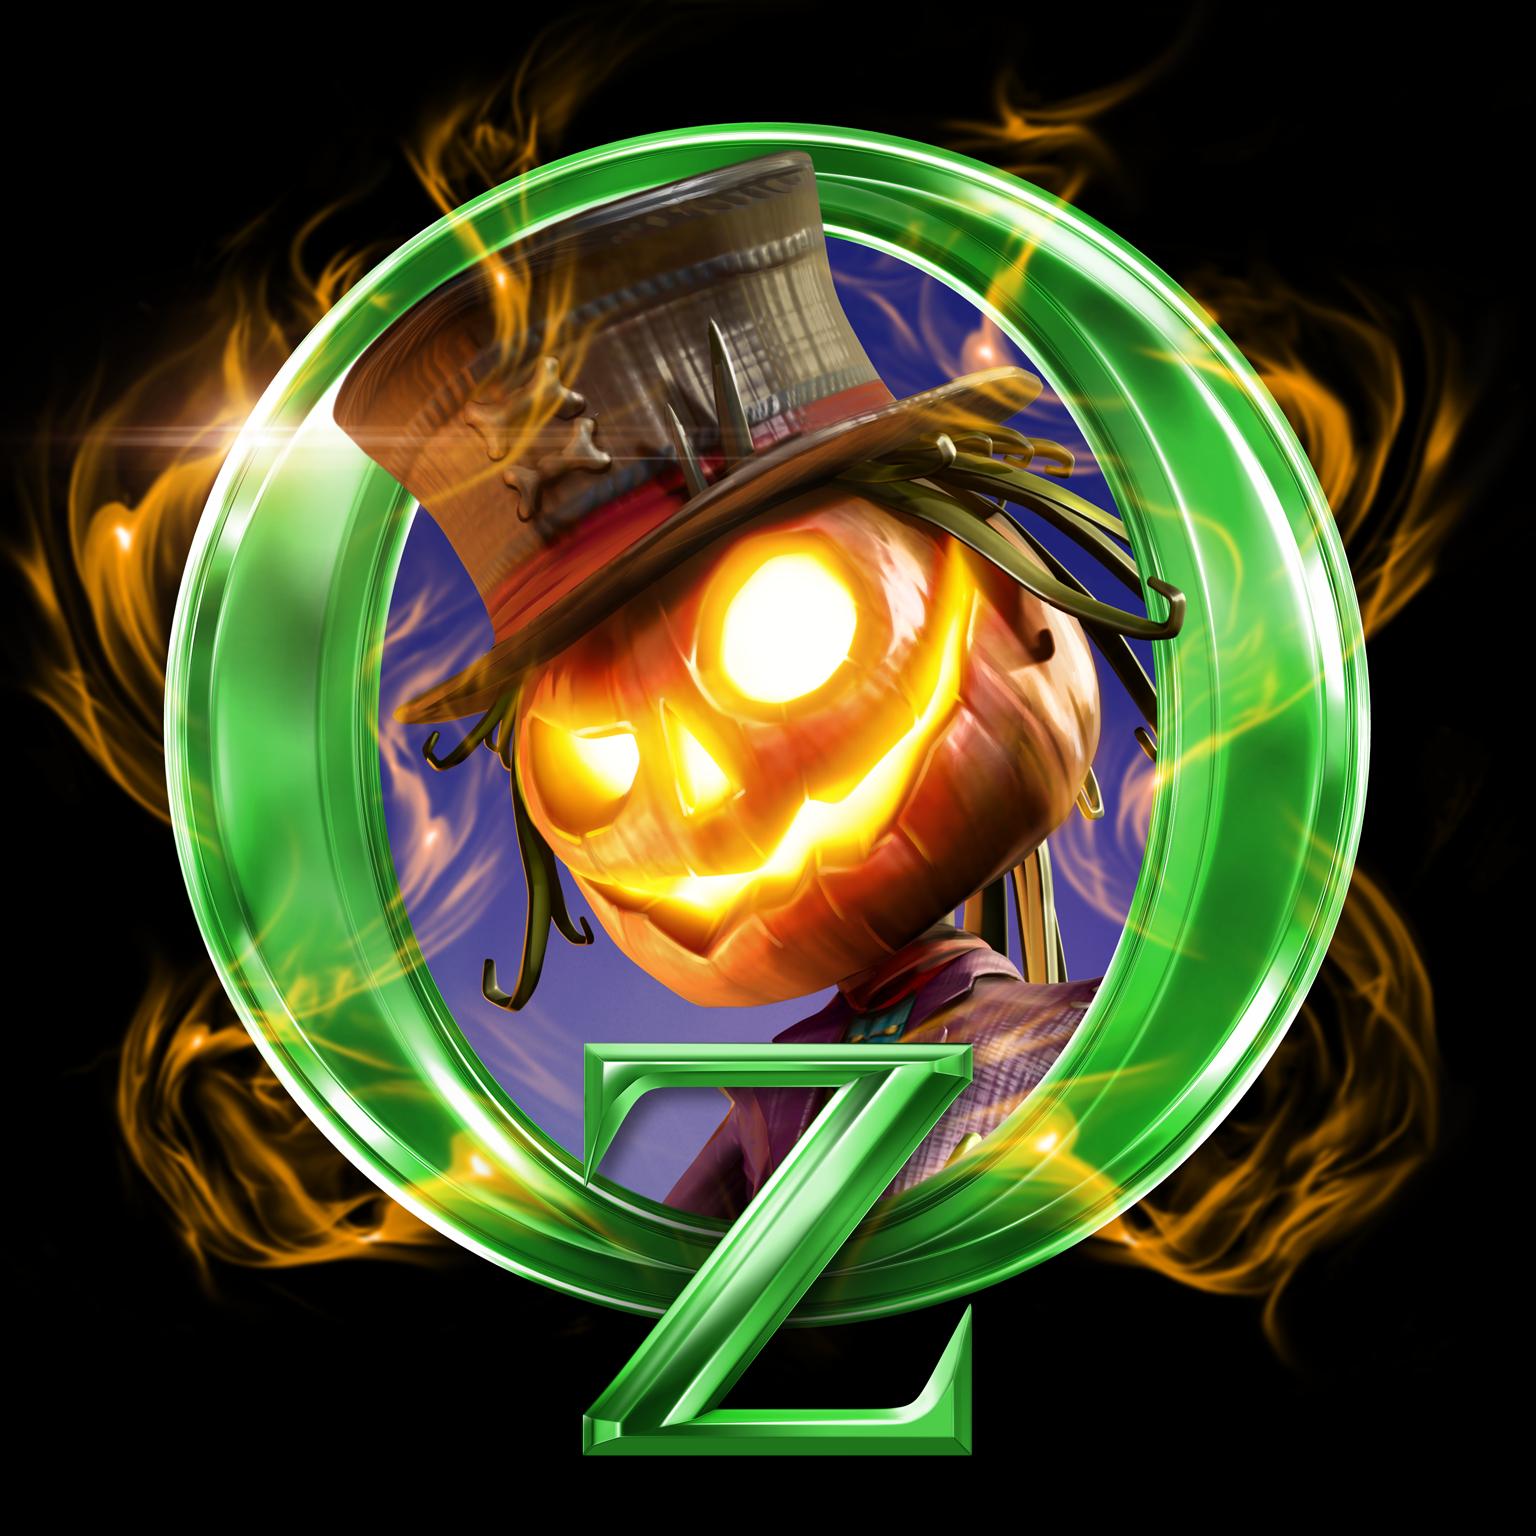 Say hello to Oz: Broken Kingdom's newest violent veggie character - Jack Pumpkinhead